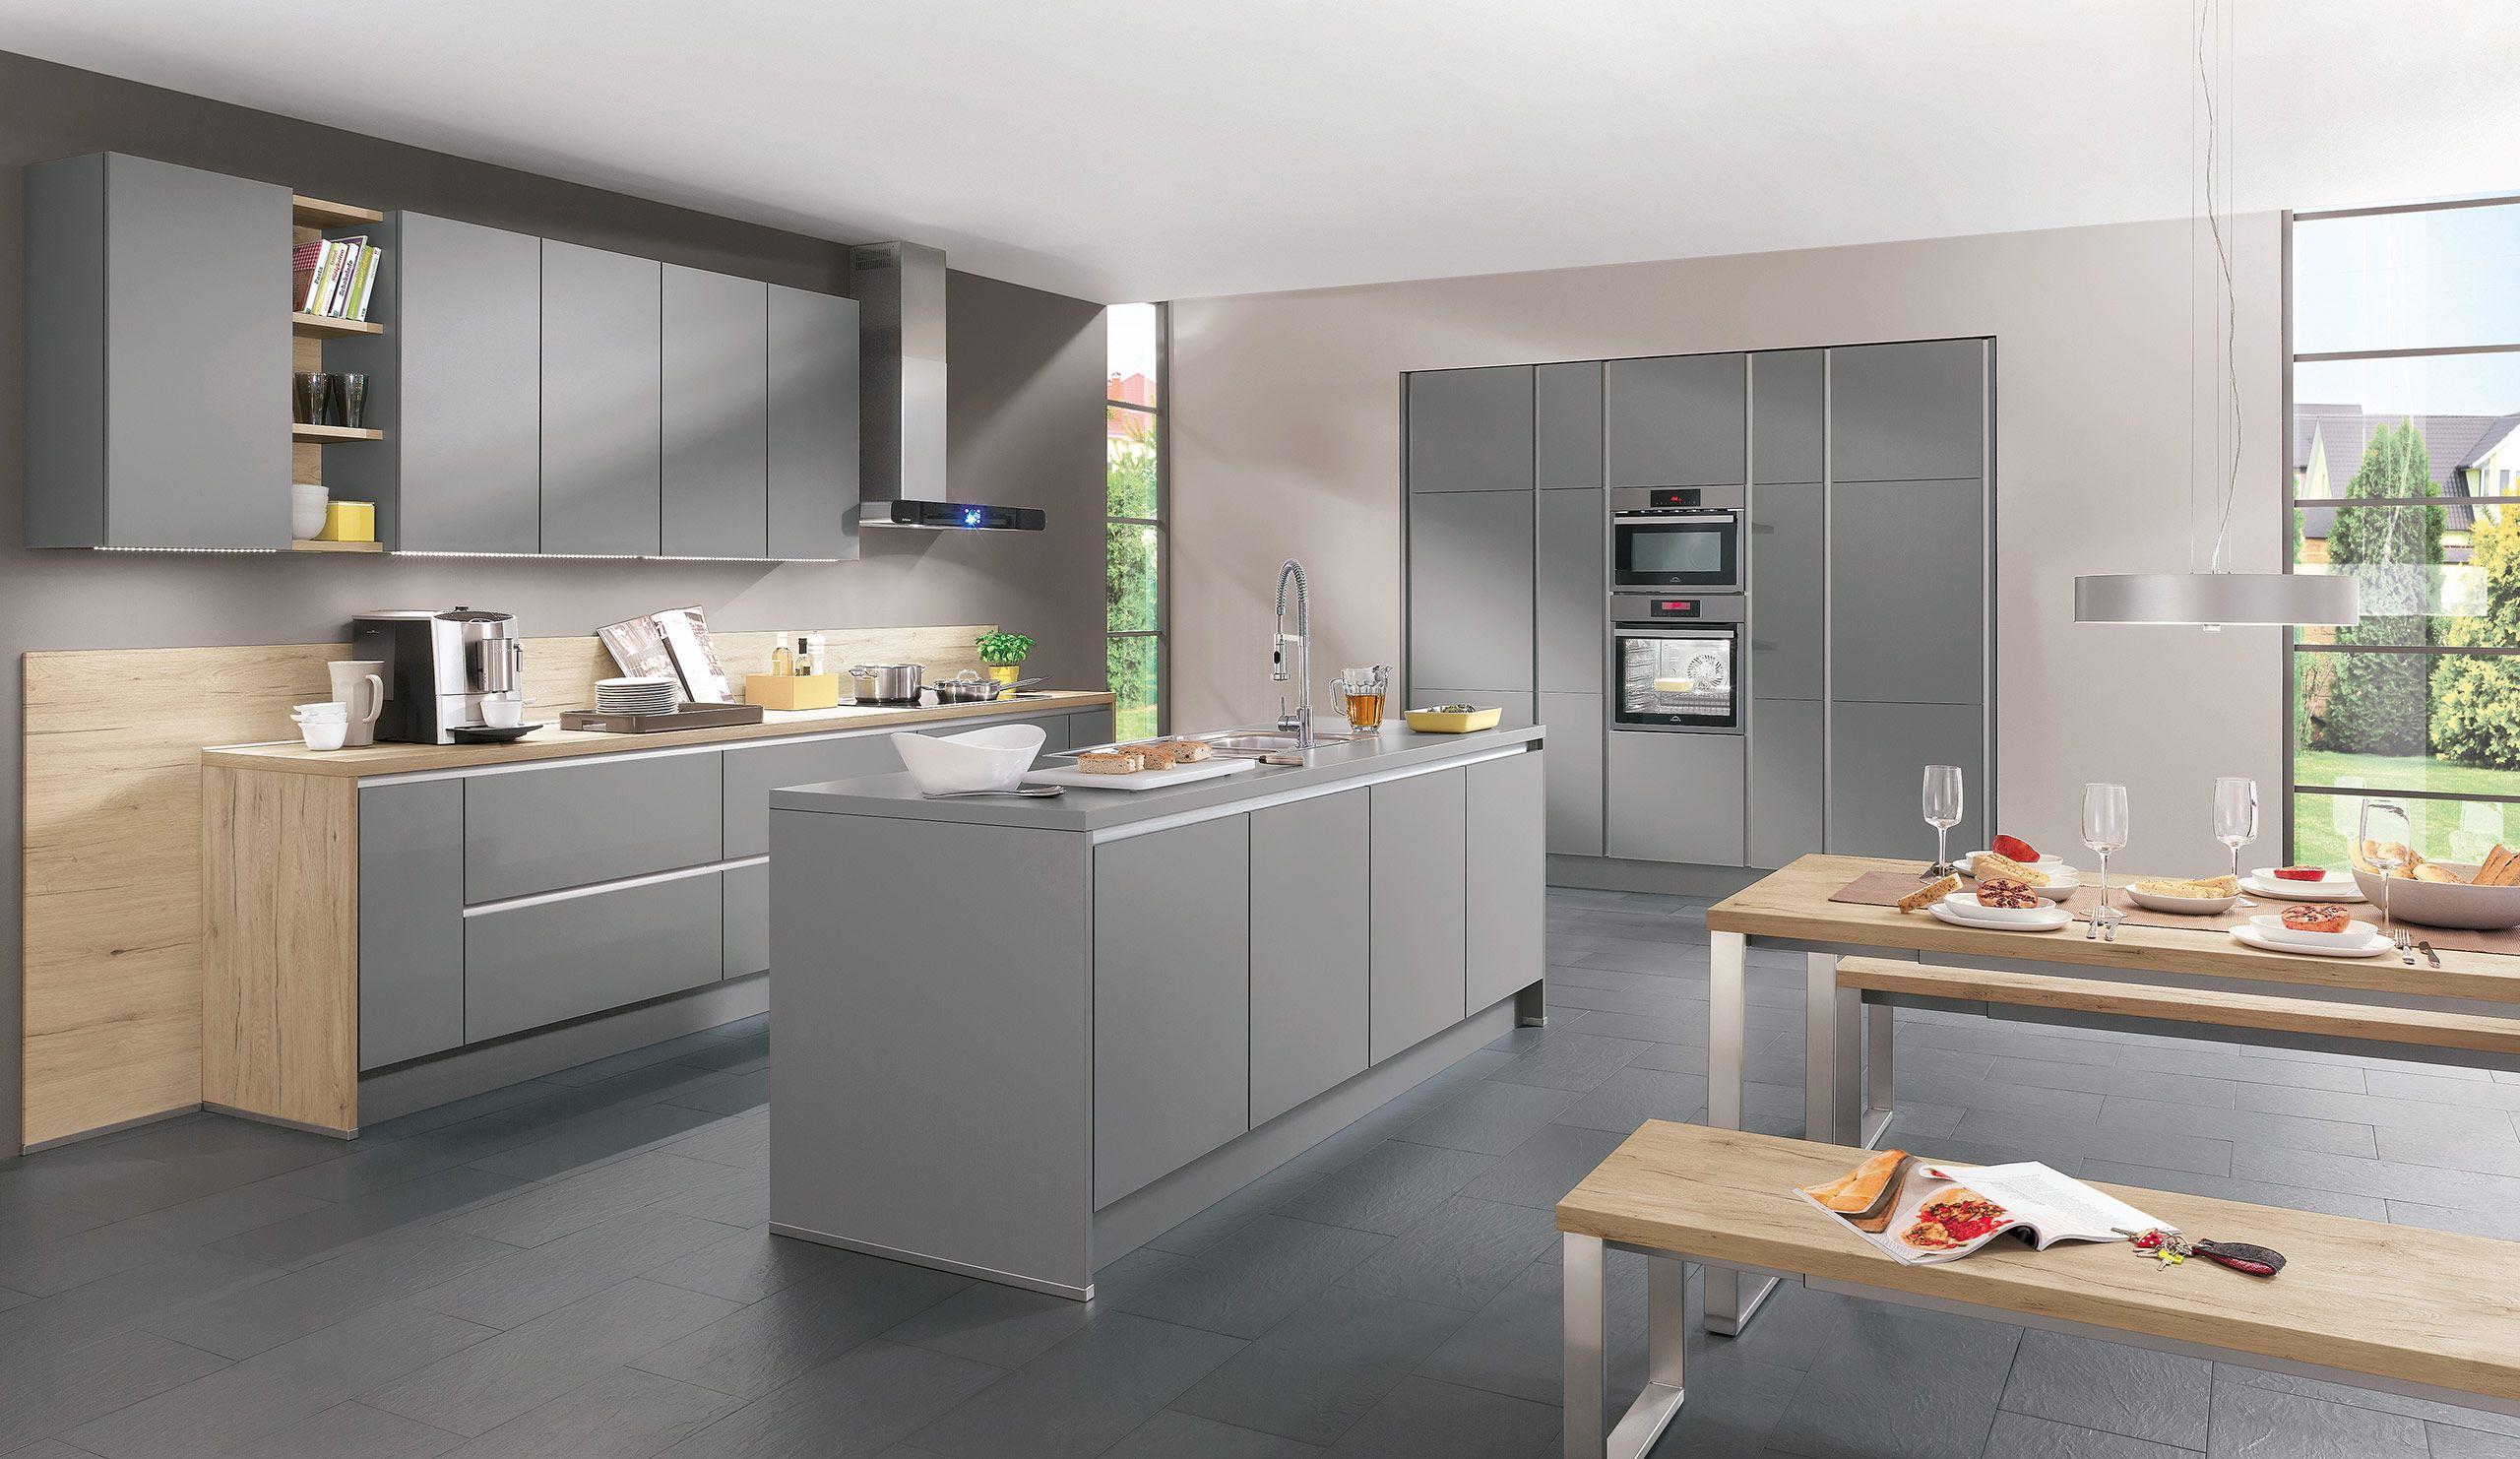 Küche Anthrazit Quelle Kochinsel https://www.kuechen-quelle.de ...